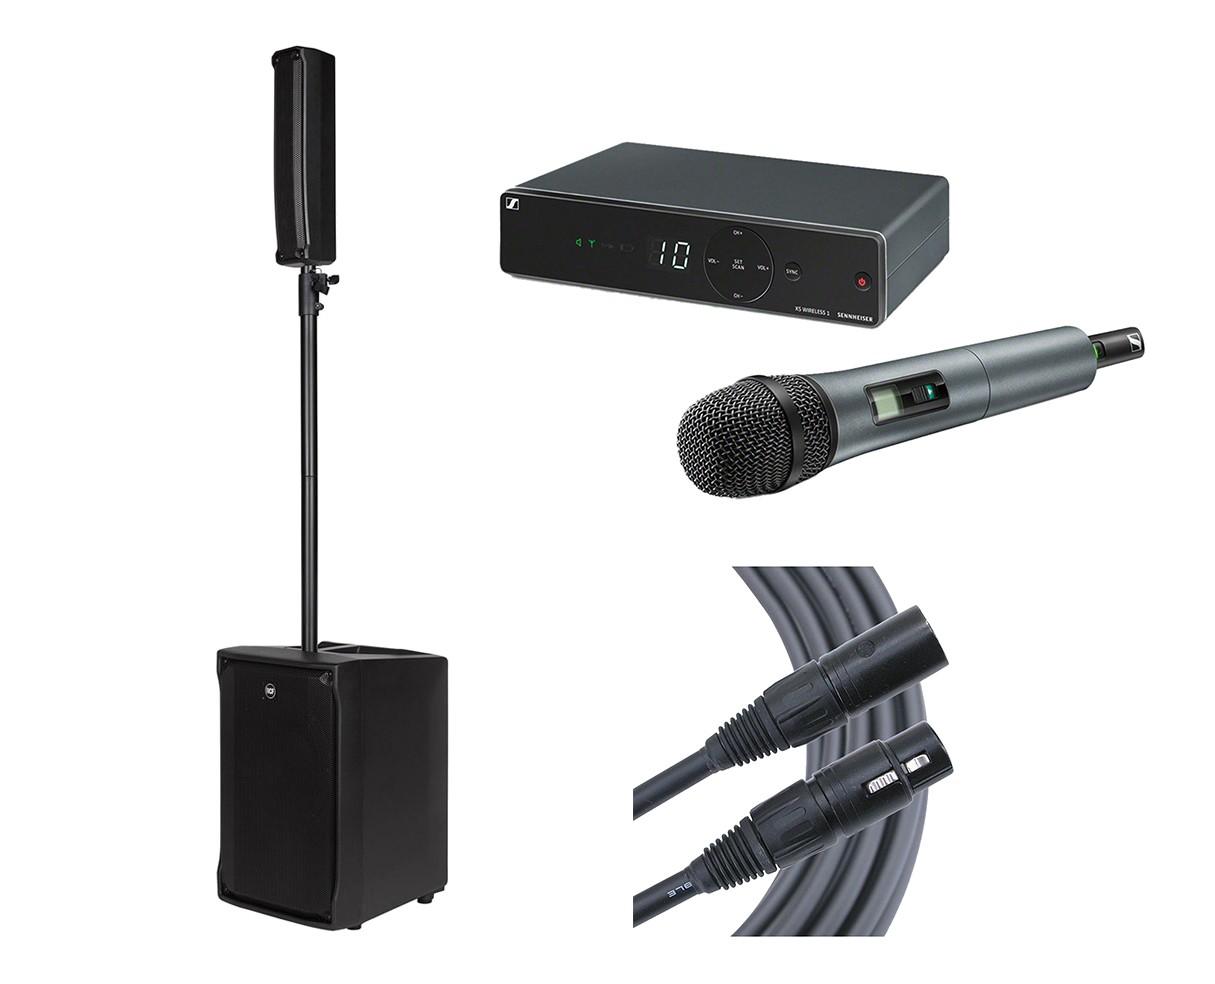 RCF EVOX JMIX8 + Sennheiser XSW 1-835 + Mogami Cable